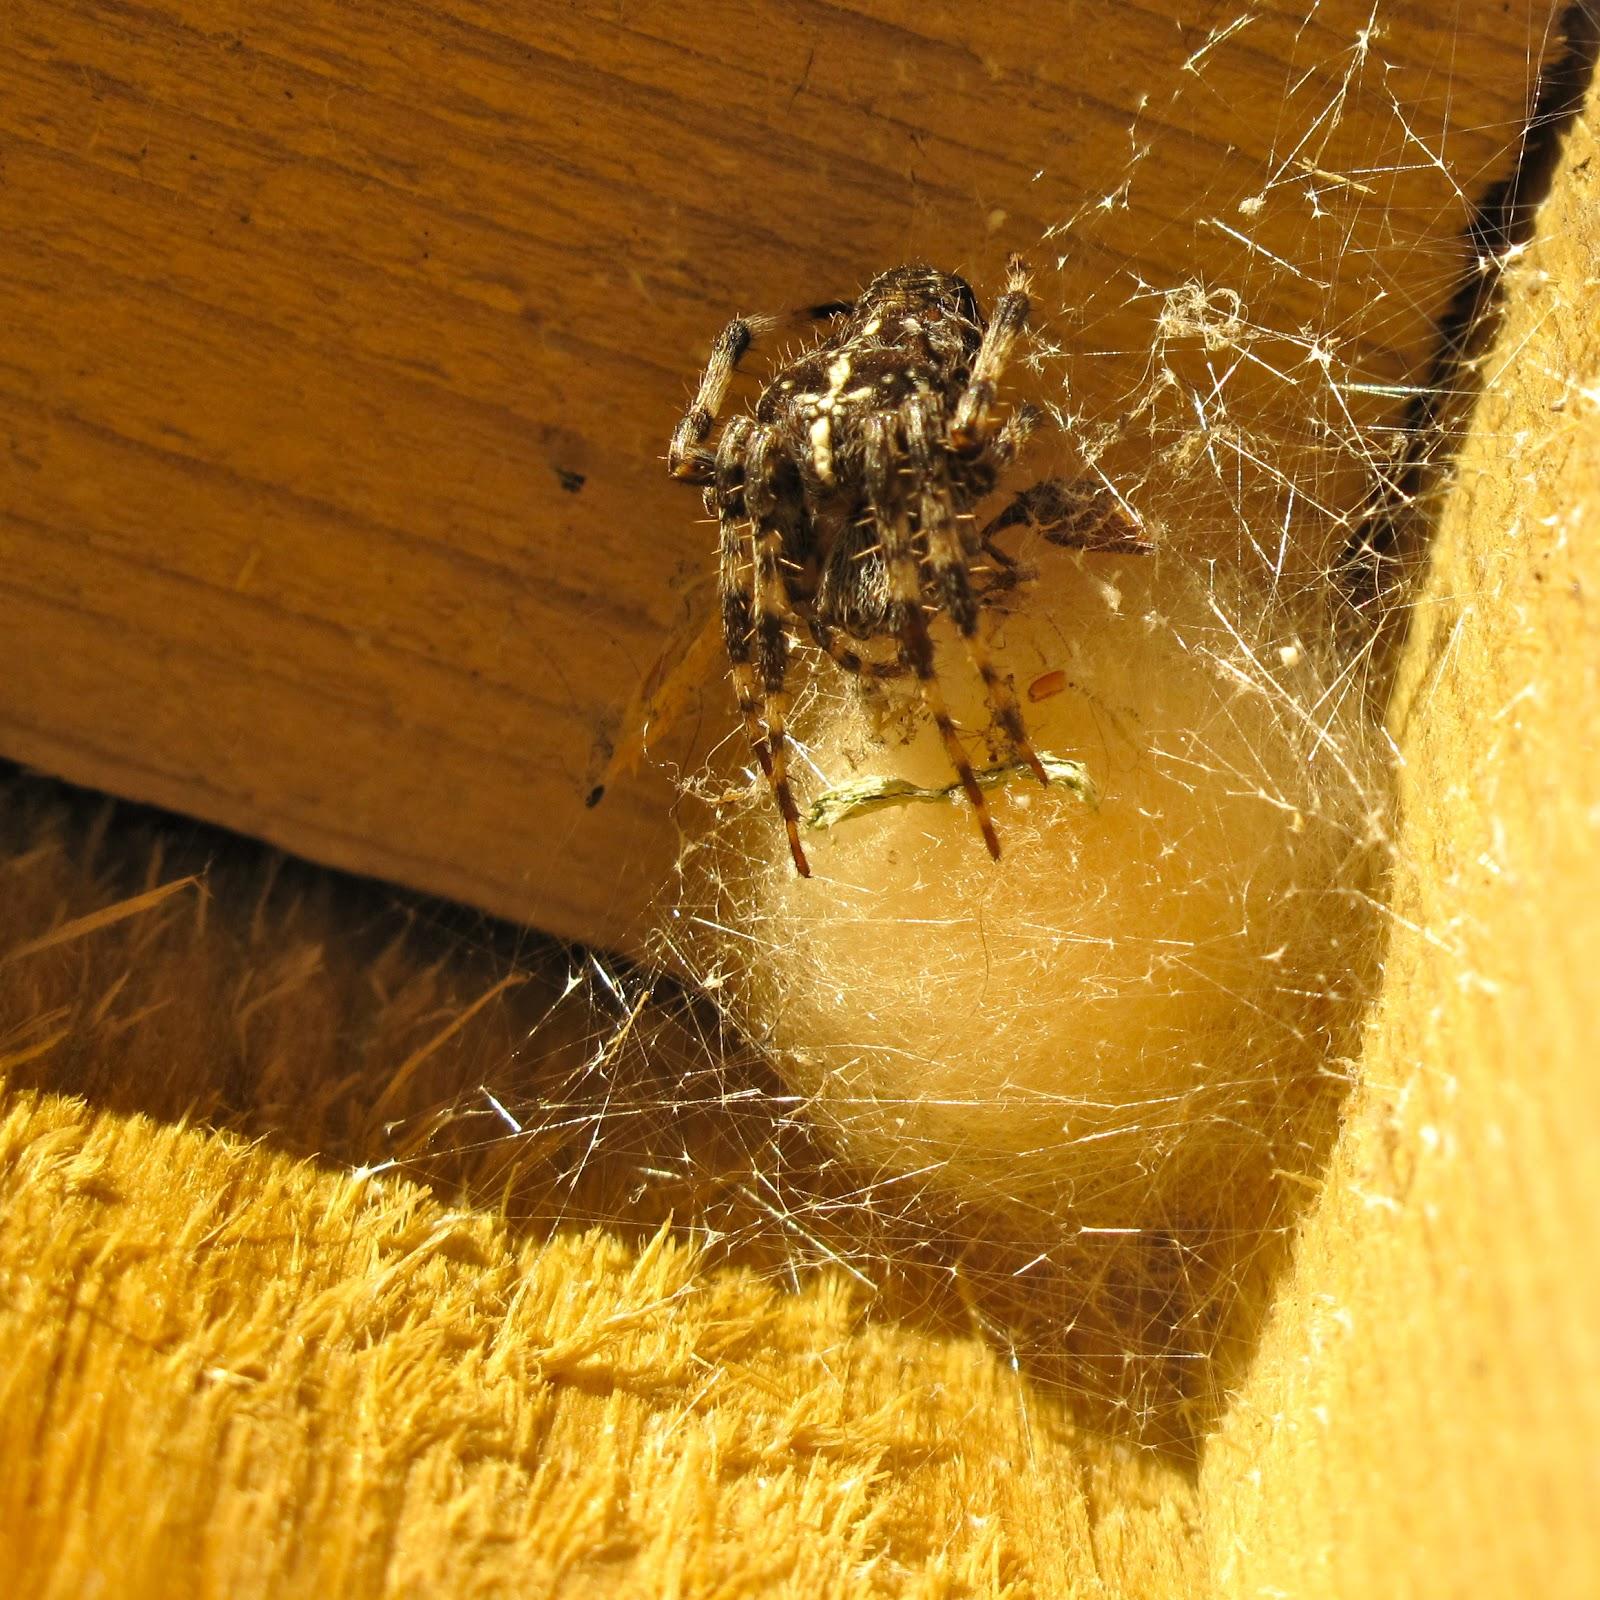 BugBlog: Araneidae: typical orb weavers